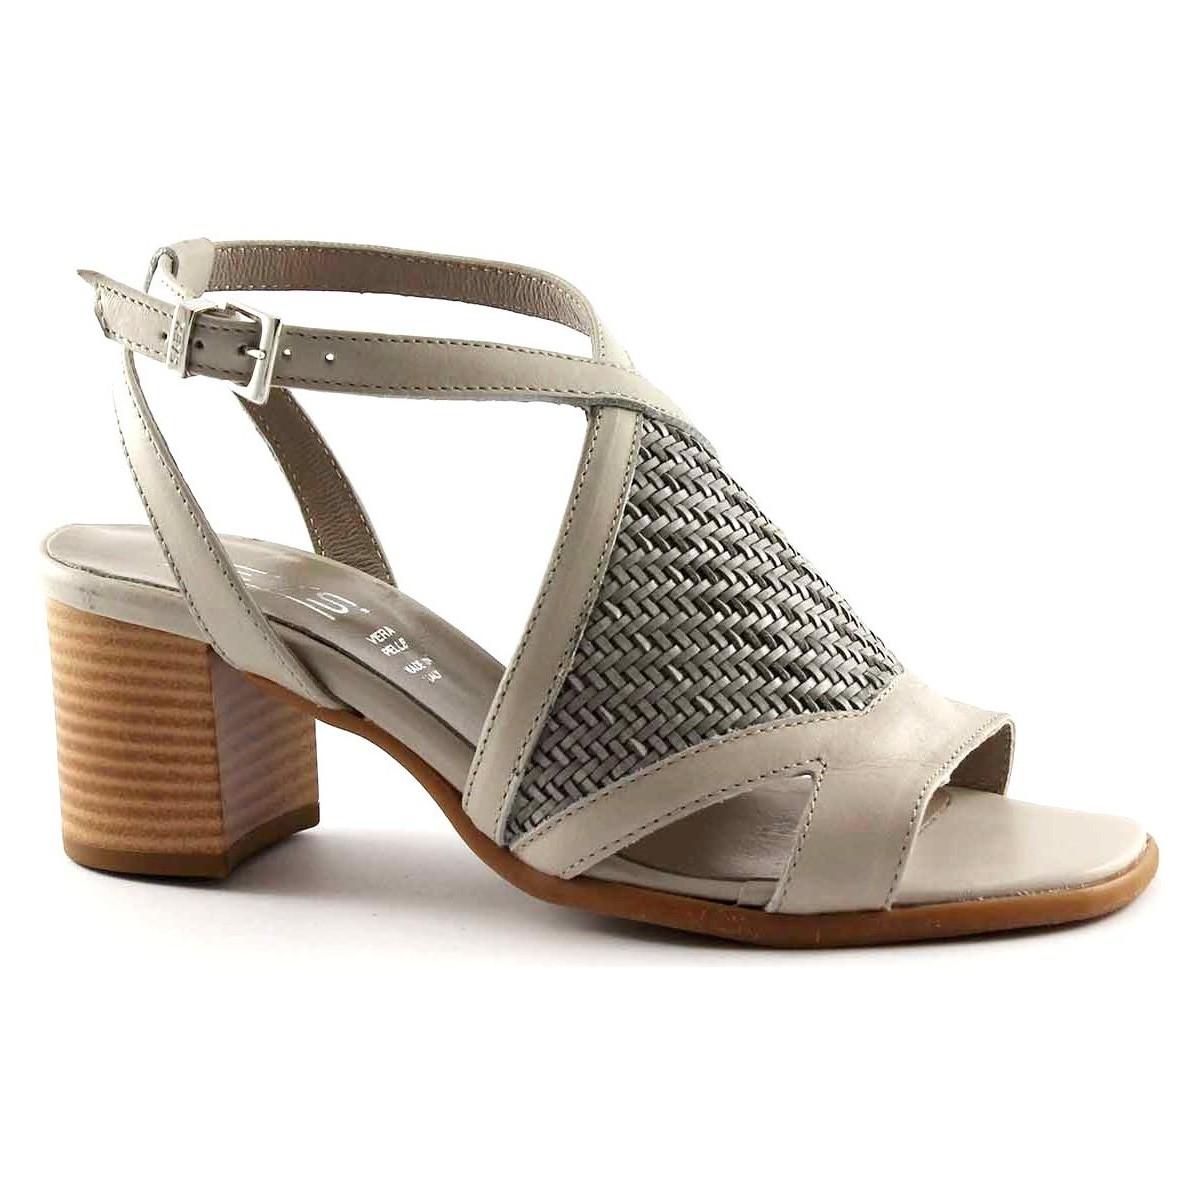 Keys Sandalen 5411 graue Schuhe Frau Schuhriemen Verwebung jetztbilligerkaufen